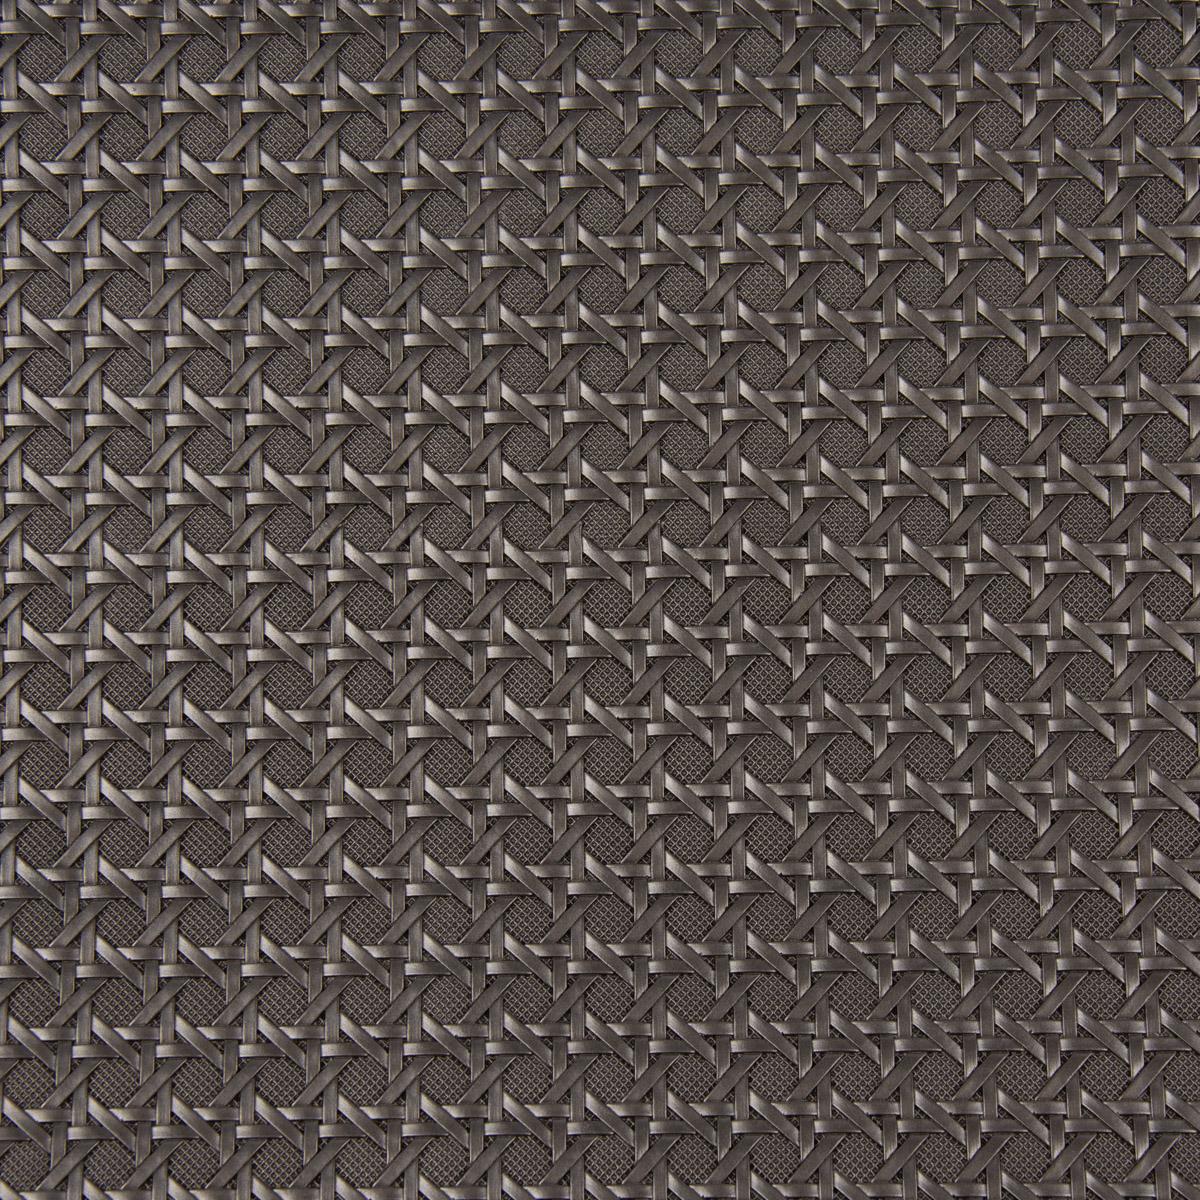 Kunstleder Lederimitat Struktur Geometrisch Relief silber-metallic 1,4m Breite